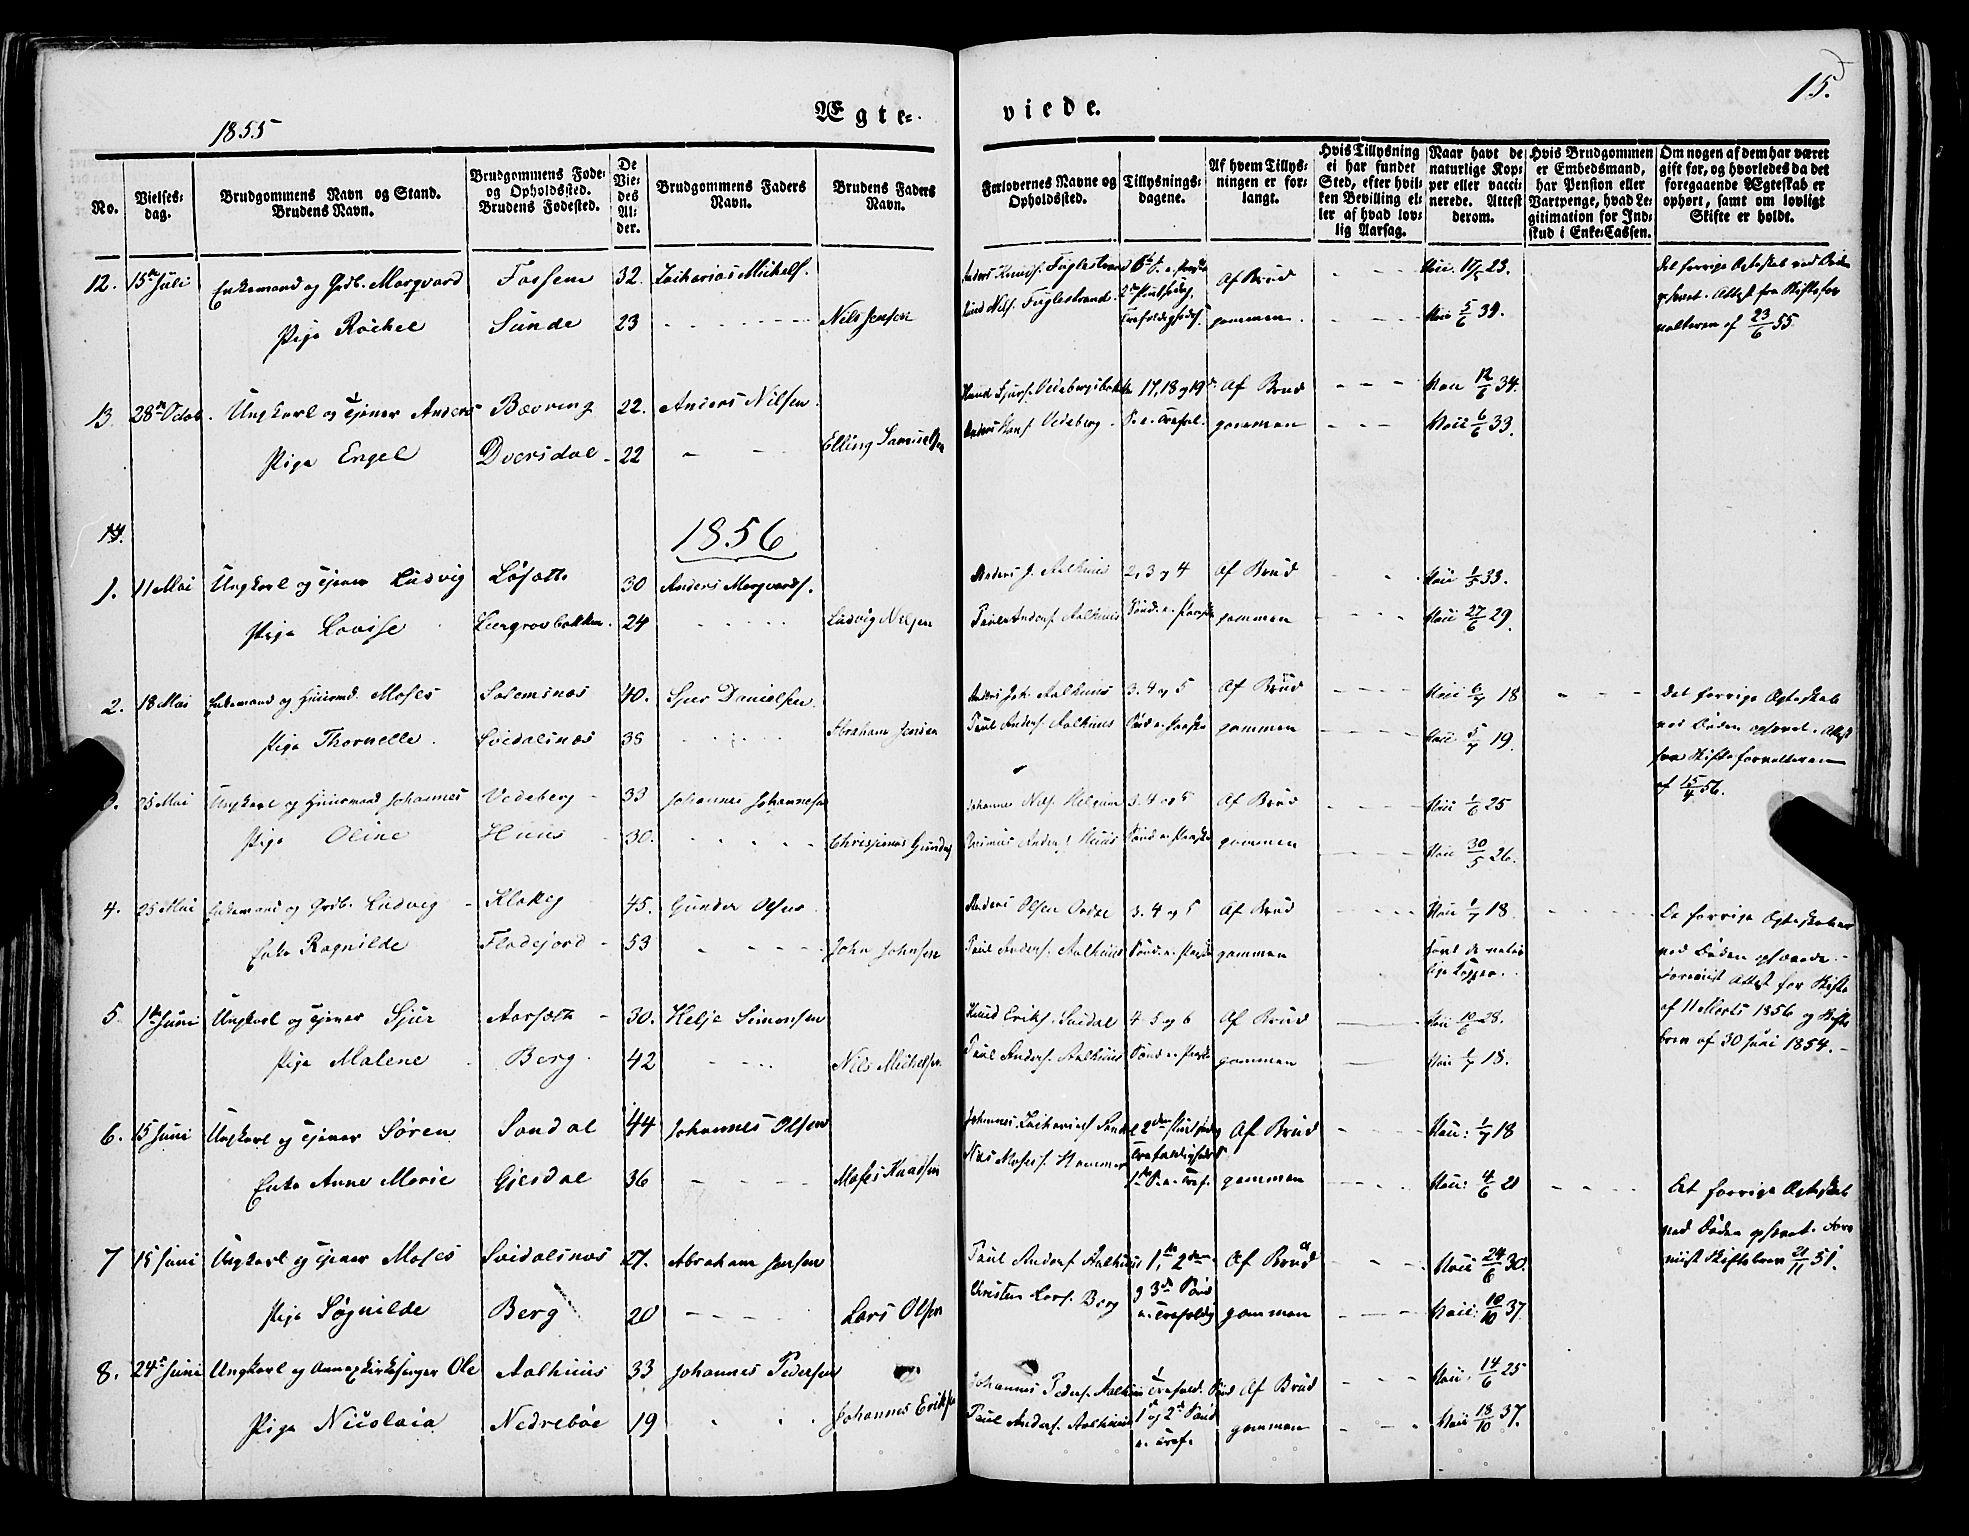 SAB, Jølster sokneprestembete, H/Haa/Haaa/L0010: Parish register (official) no. A 10, 1847-1865, p. 15